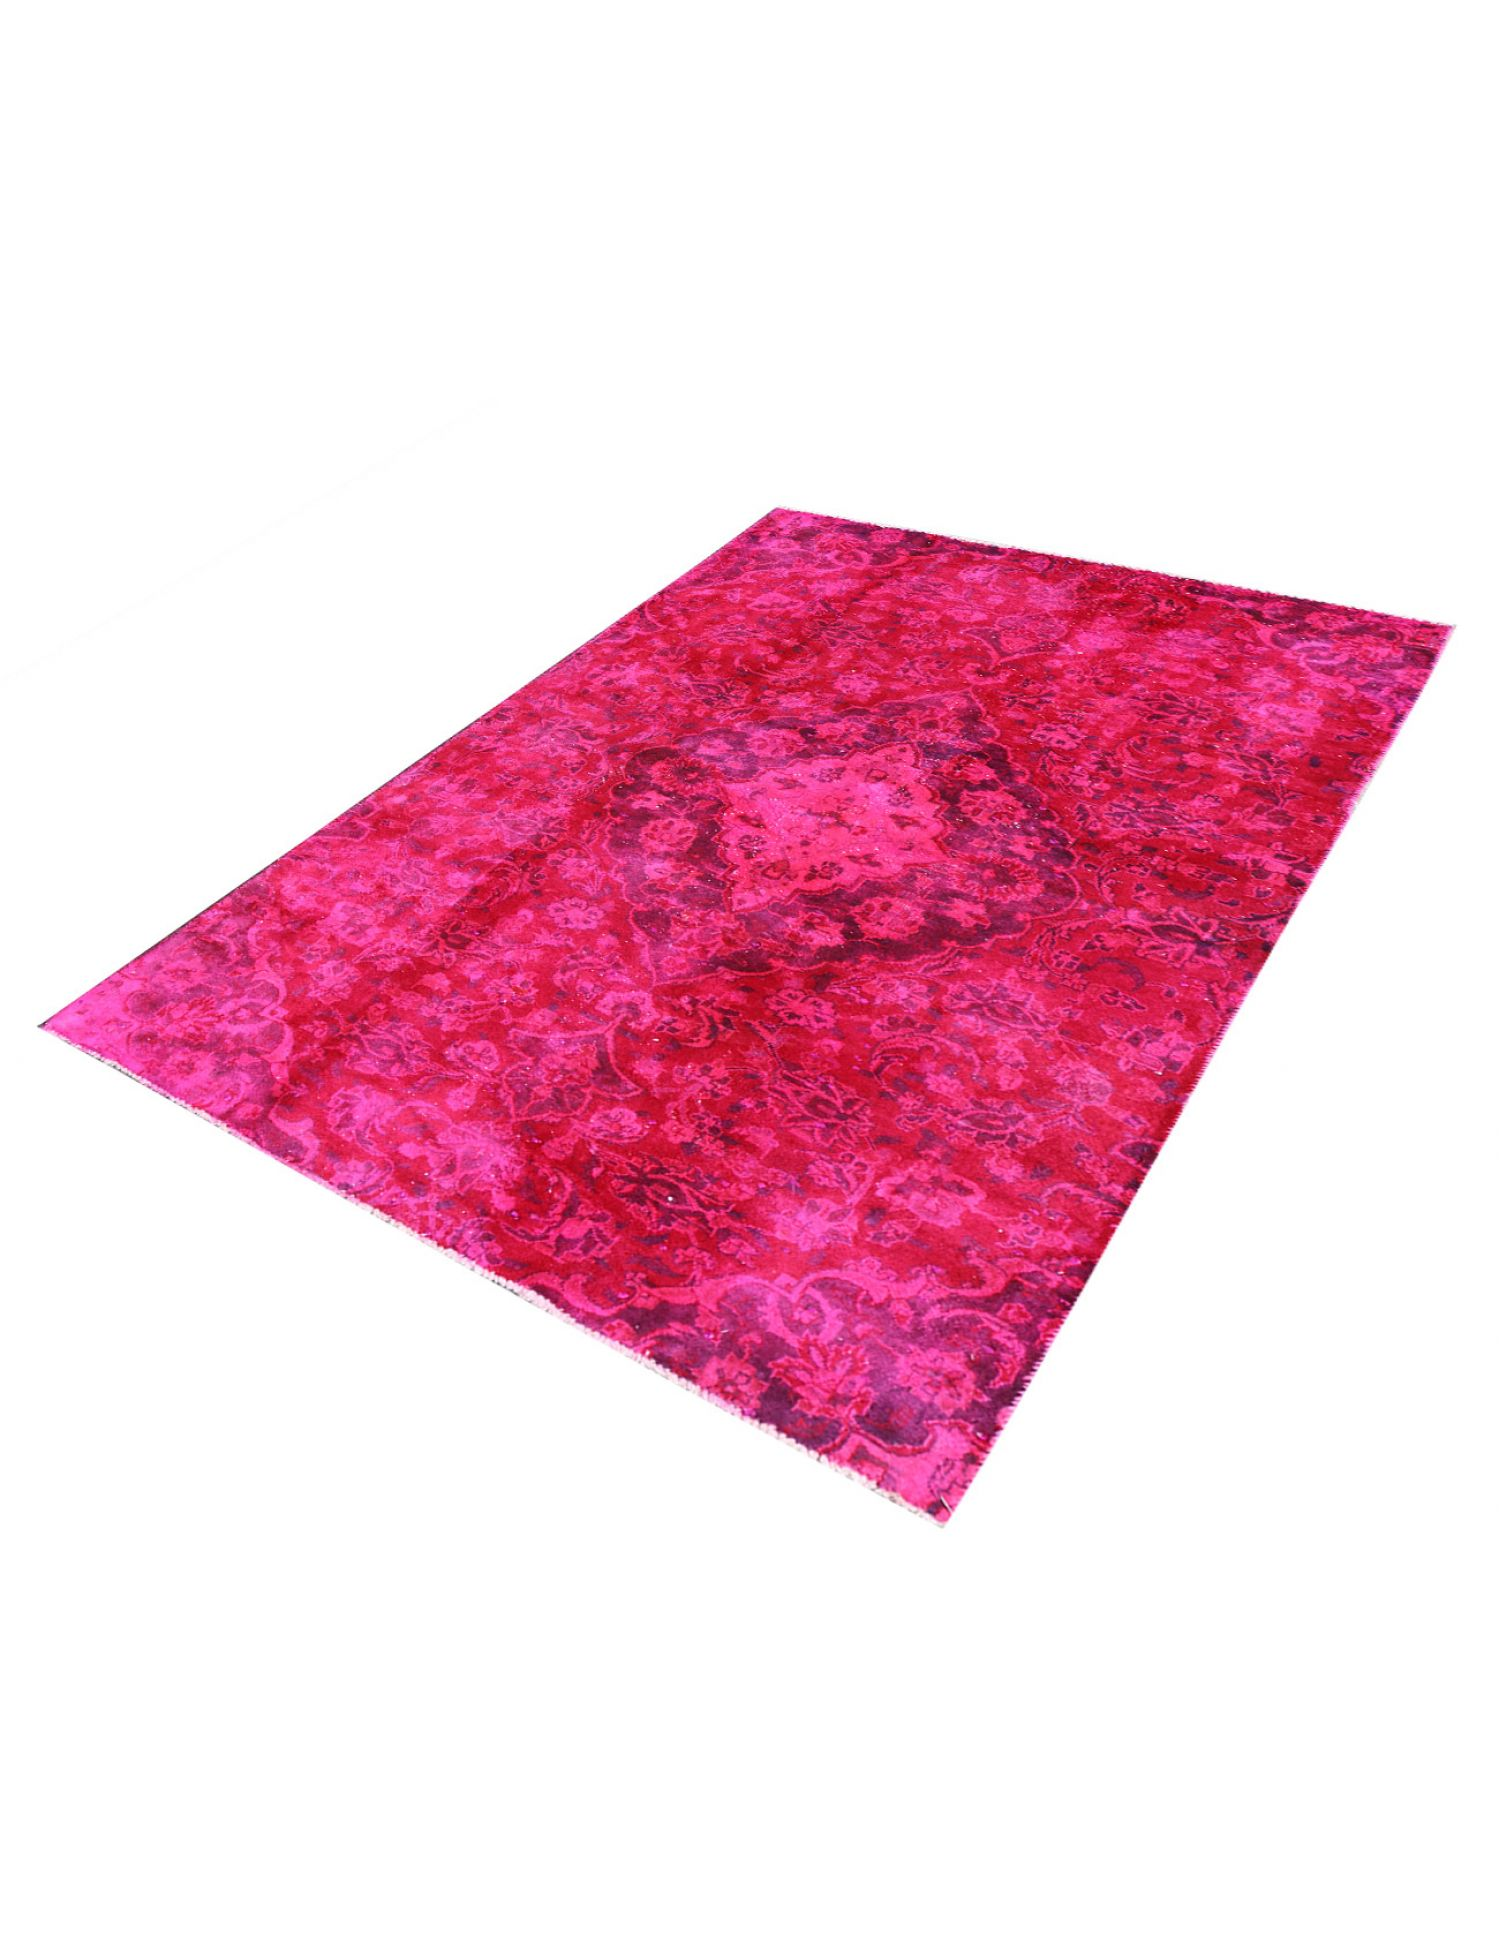 Tappeto Vintage  rosso <br/>200 x 111 cm